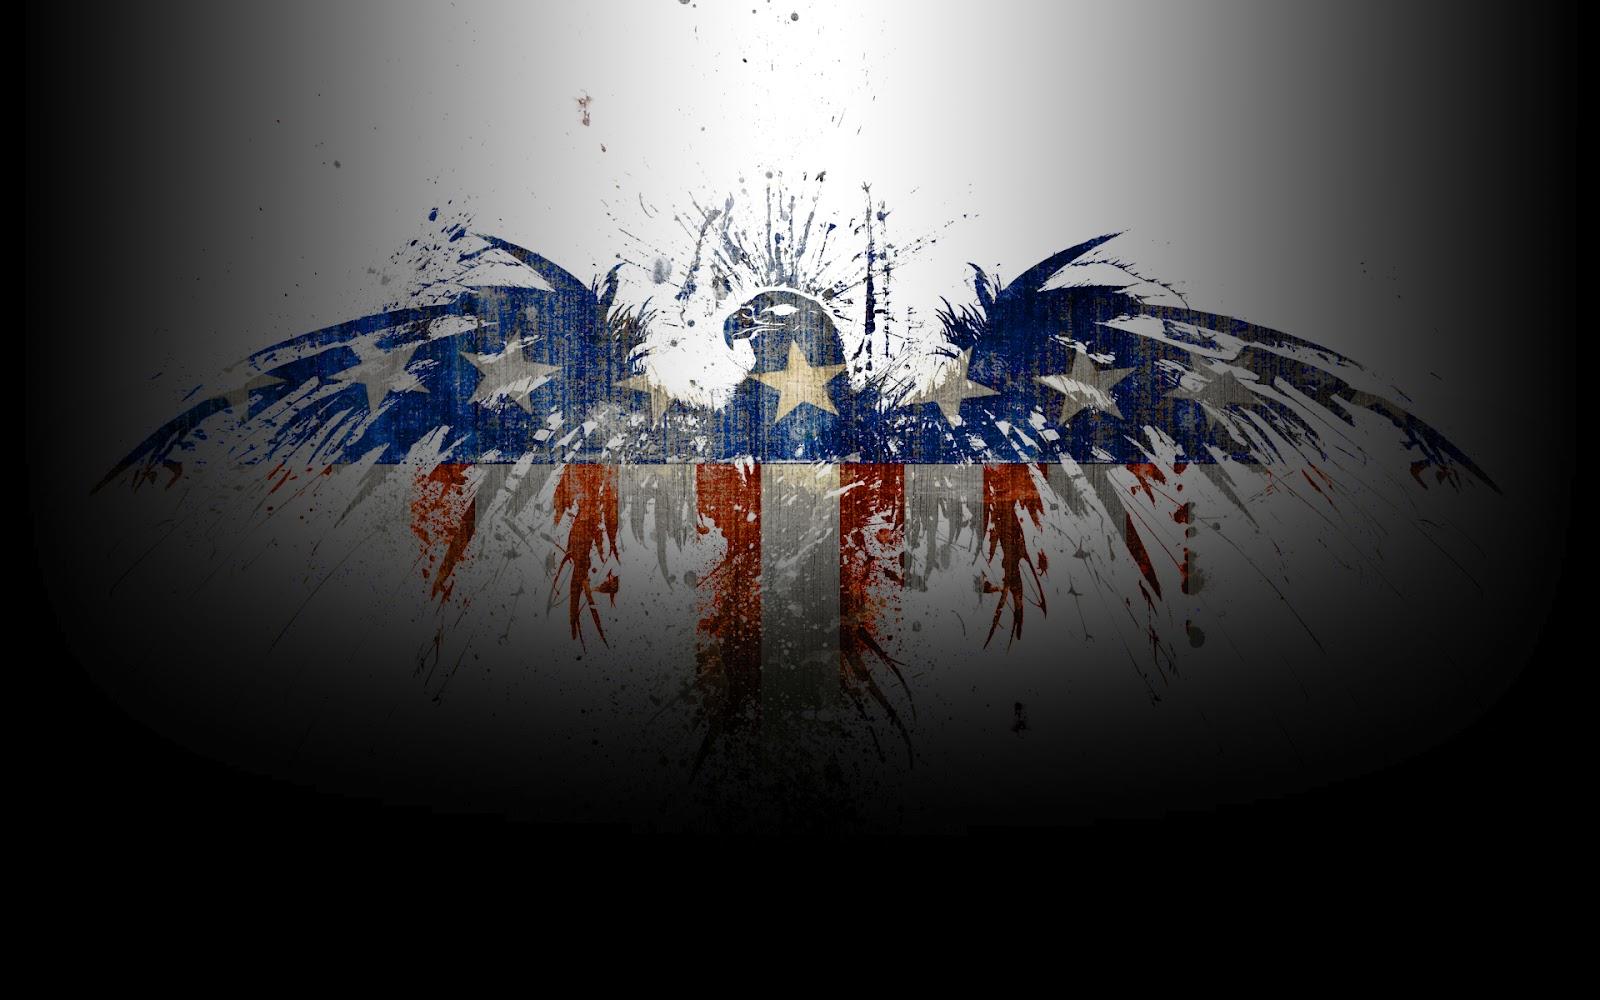 Wallpaper a day: american eagle wallpaper